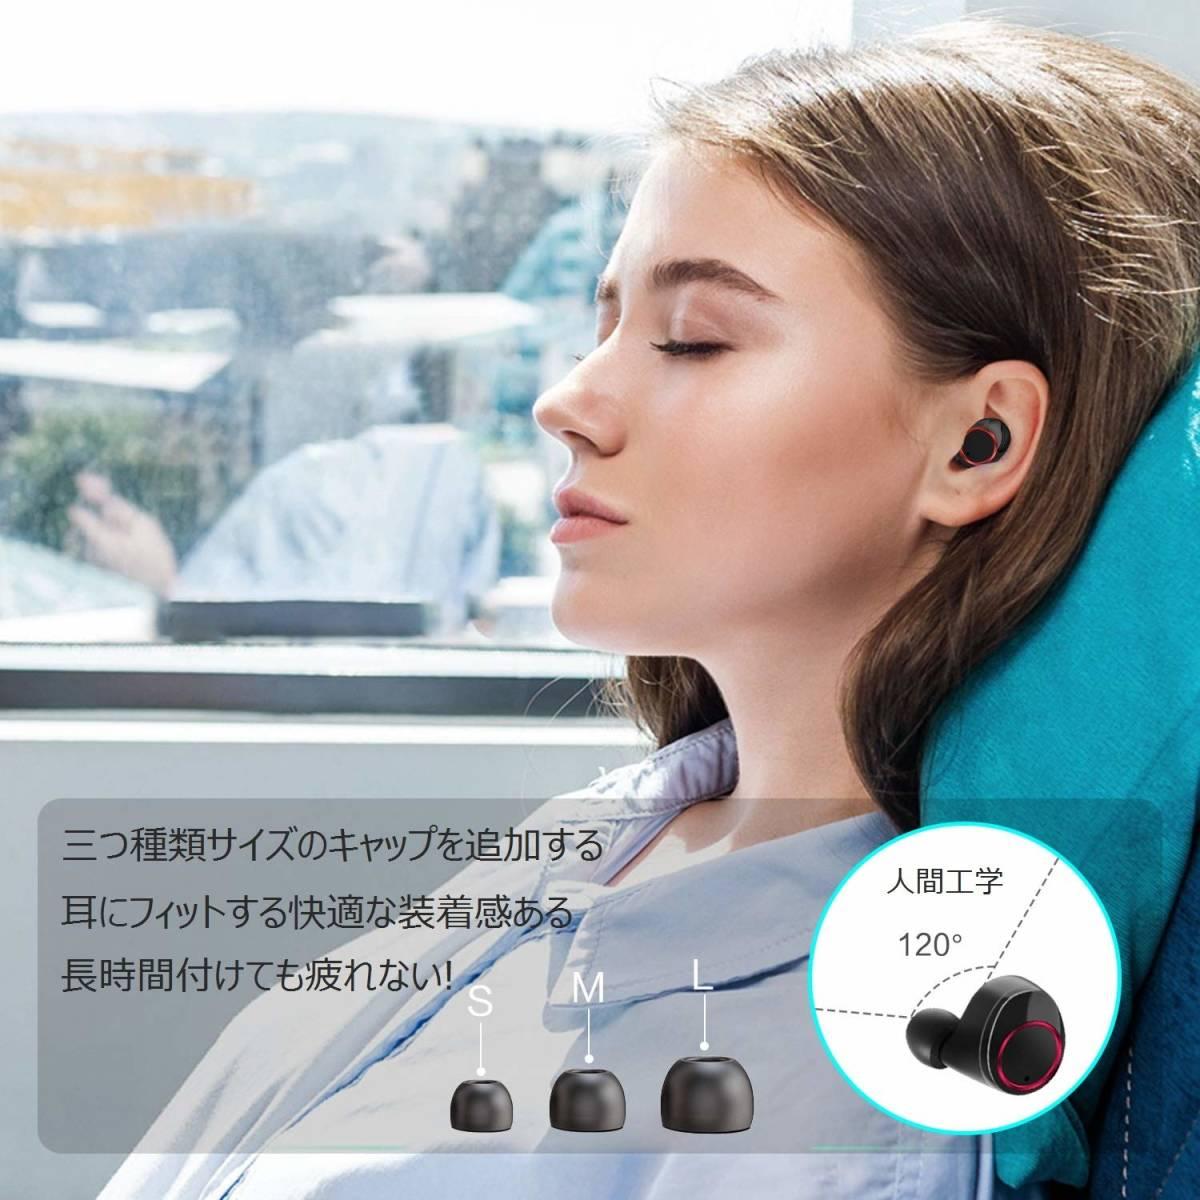 * new goods * unused * wireless earphone Bluetooth earphone height sound quality complete wireless earphone waterproof IPX7 deep bass automatic pairing both ear left right